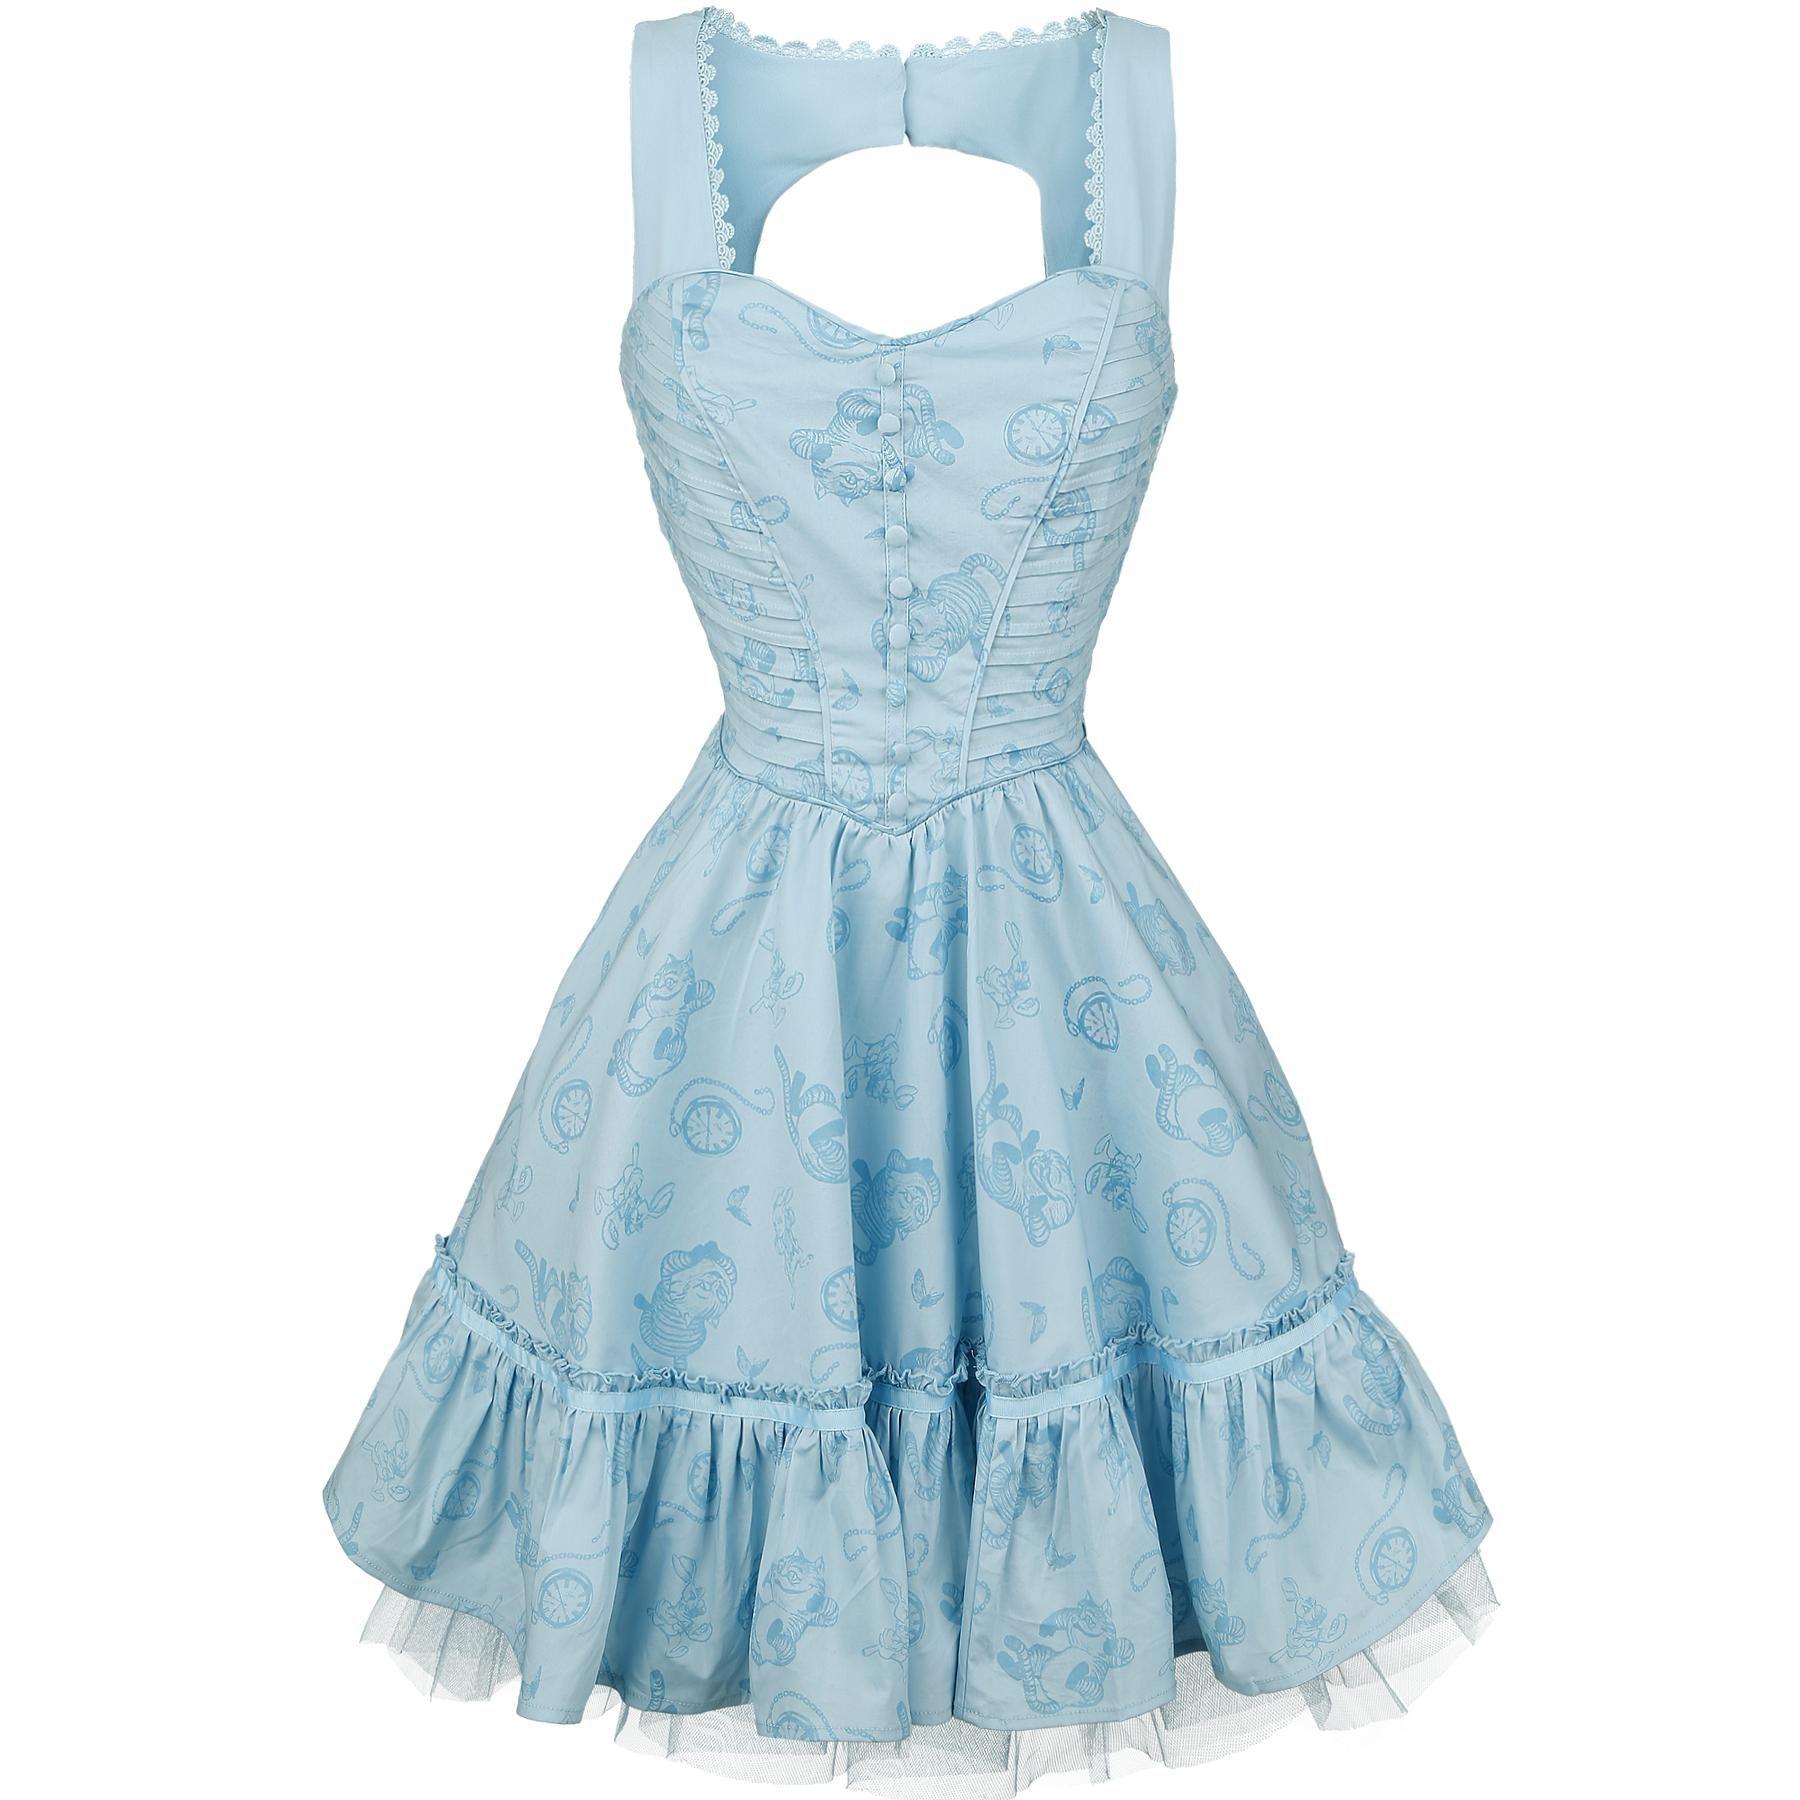 Hinter den Spiegeln | Classic dresses, Alice and Dress robes